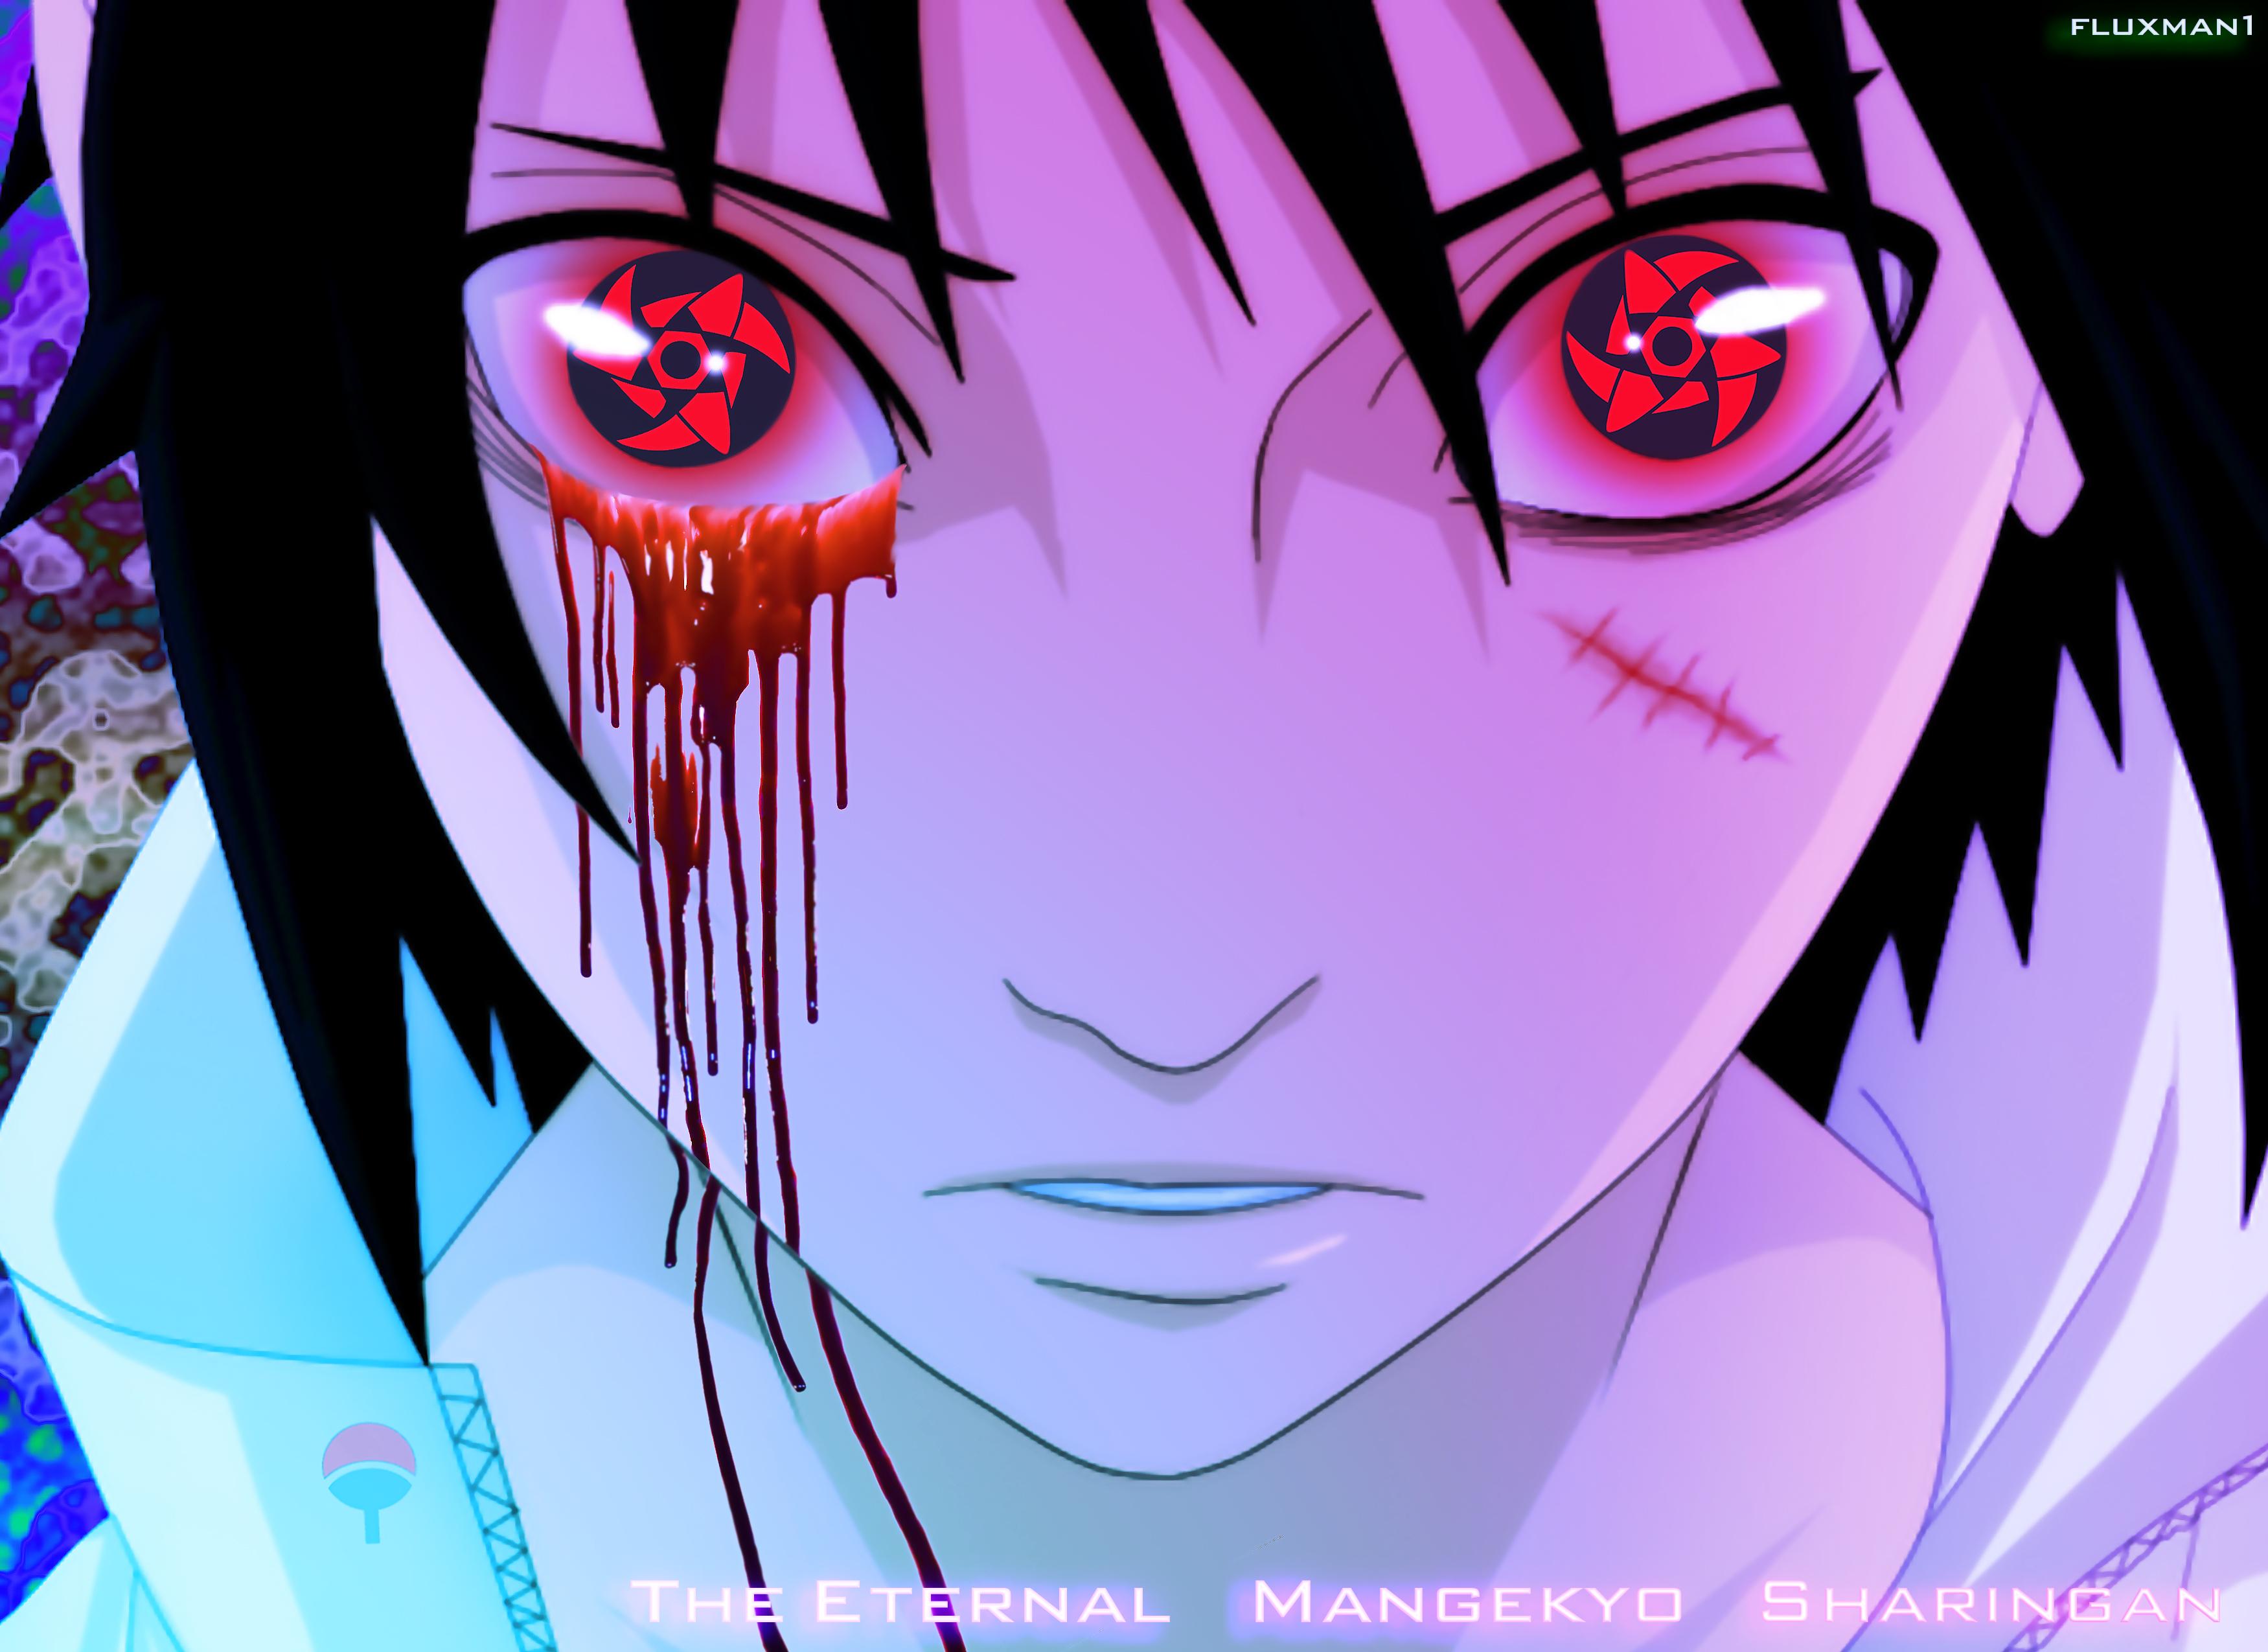 Free Download Sasuke Uchiha Mangekyou Sharingan Gif The